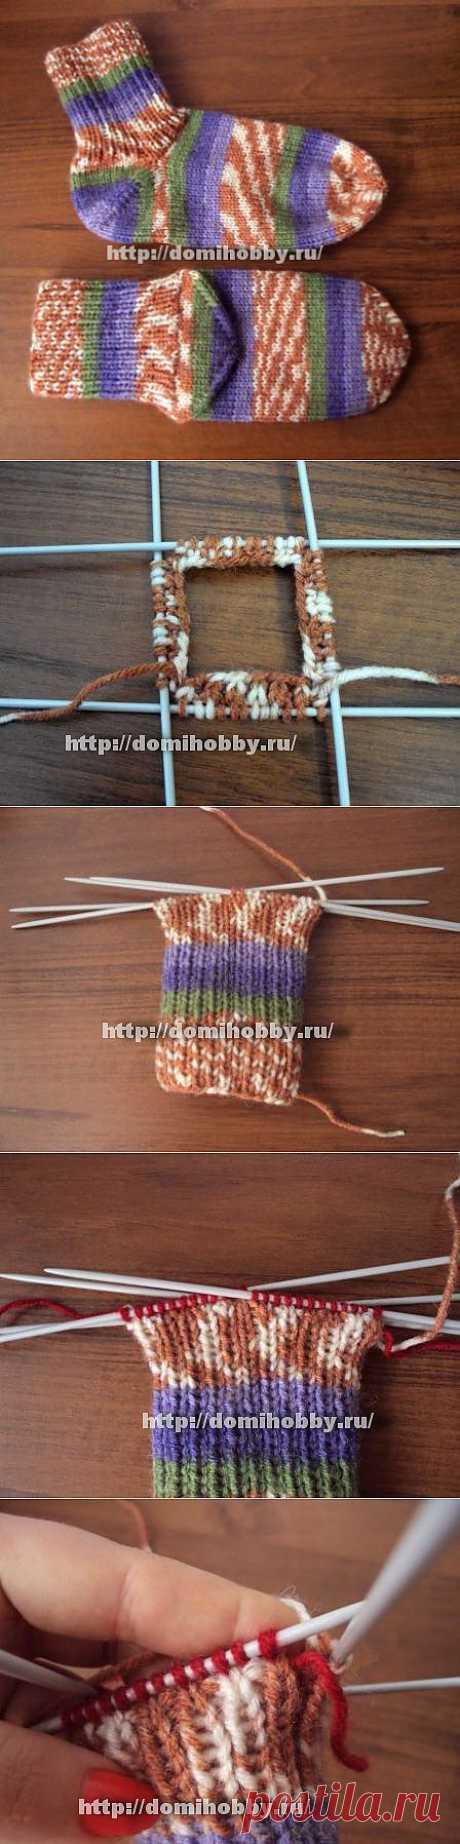 цитата Olga-E2 : вязание носков с отдельной пяткой (08:42 26-09-2013) [4124701/292985641] - valentina.fedcko@mail.ru - Почта Mail.Ru